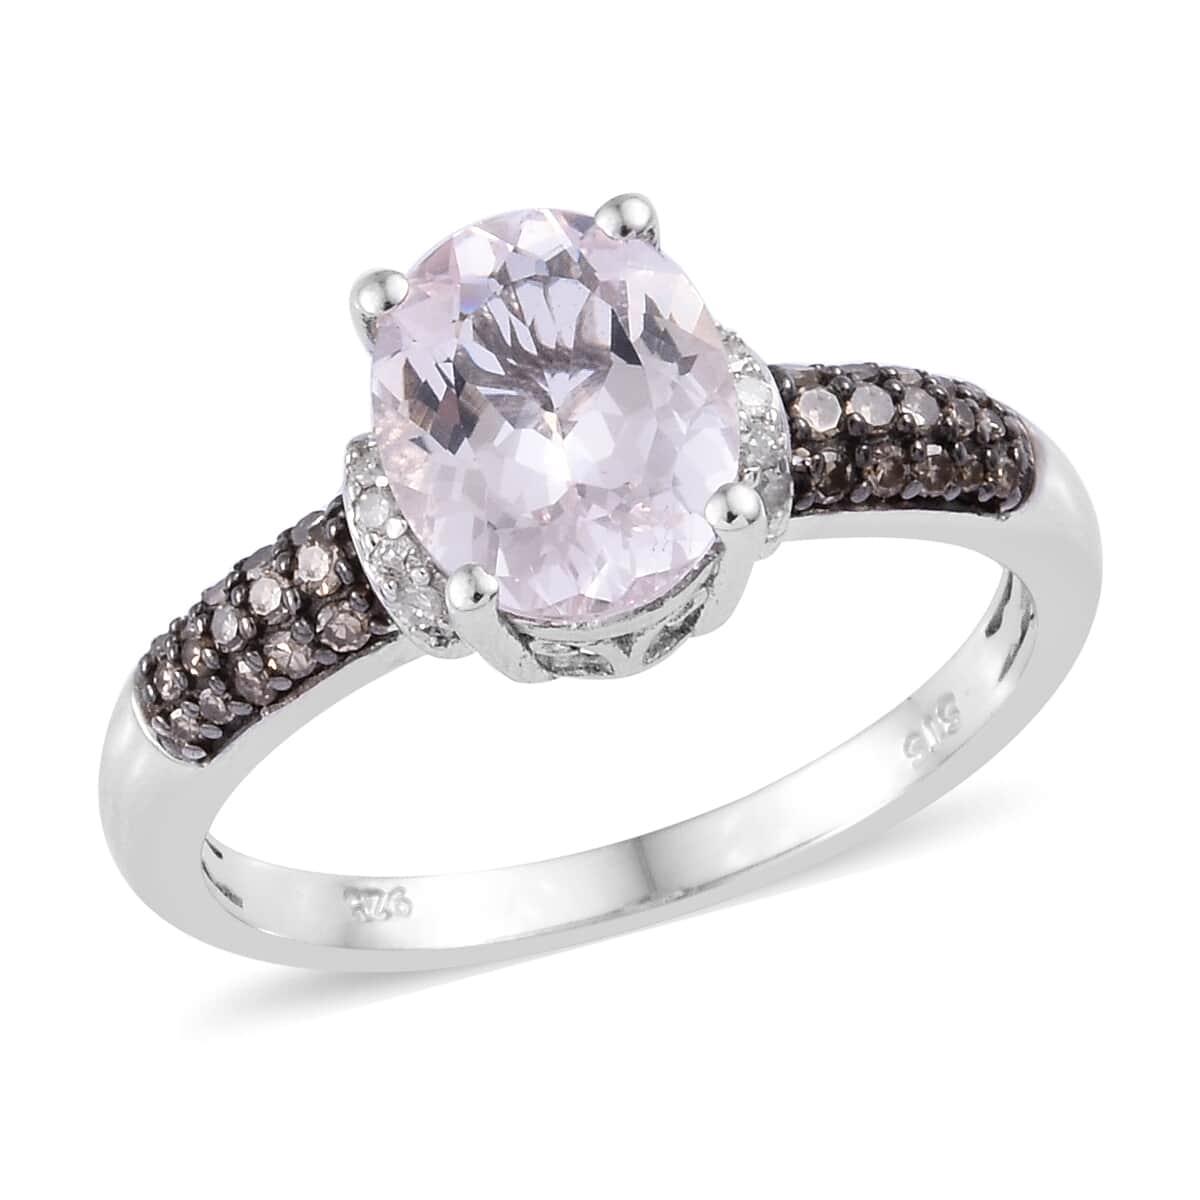 Marropino Pink Morganite, Diamond (0.25 ct) Ring in Rhodium & Platinum Over Sterling Silver (Size 9.0) 2.50 ctw